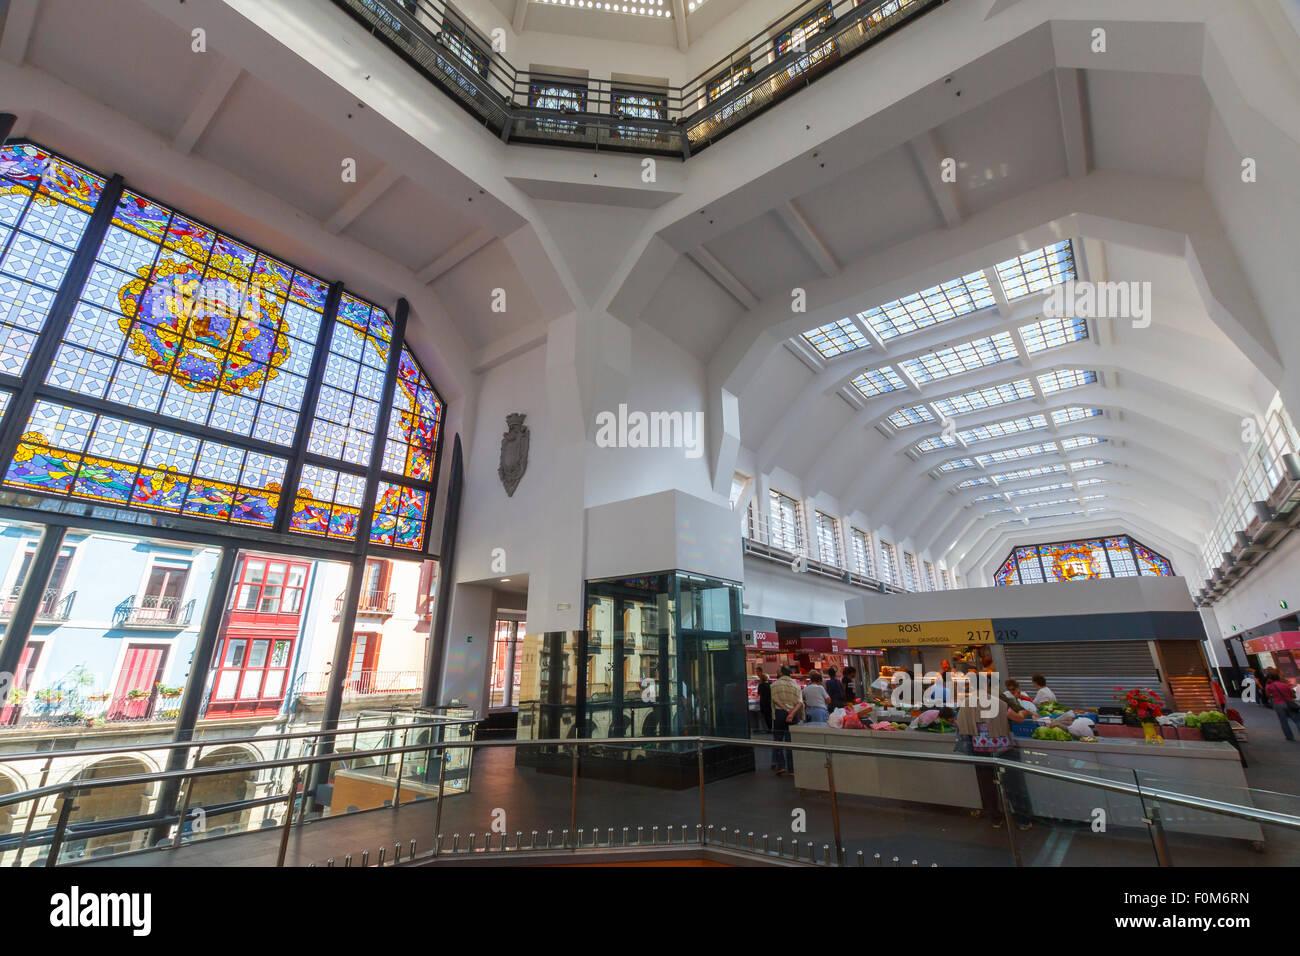 La Ribera Market. Bilbao. - Stock Image